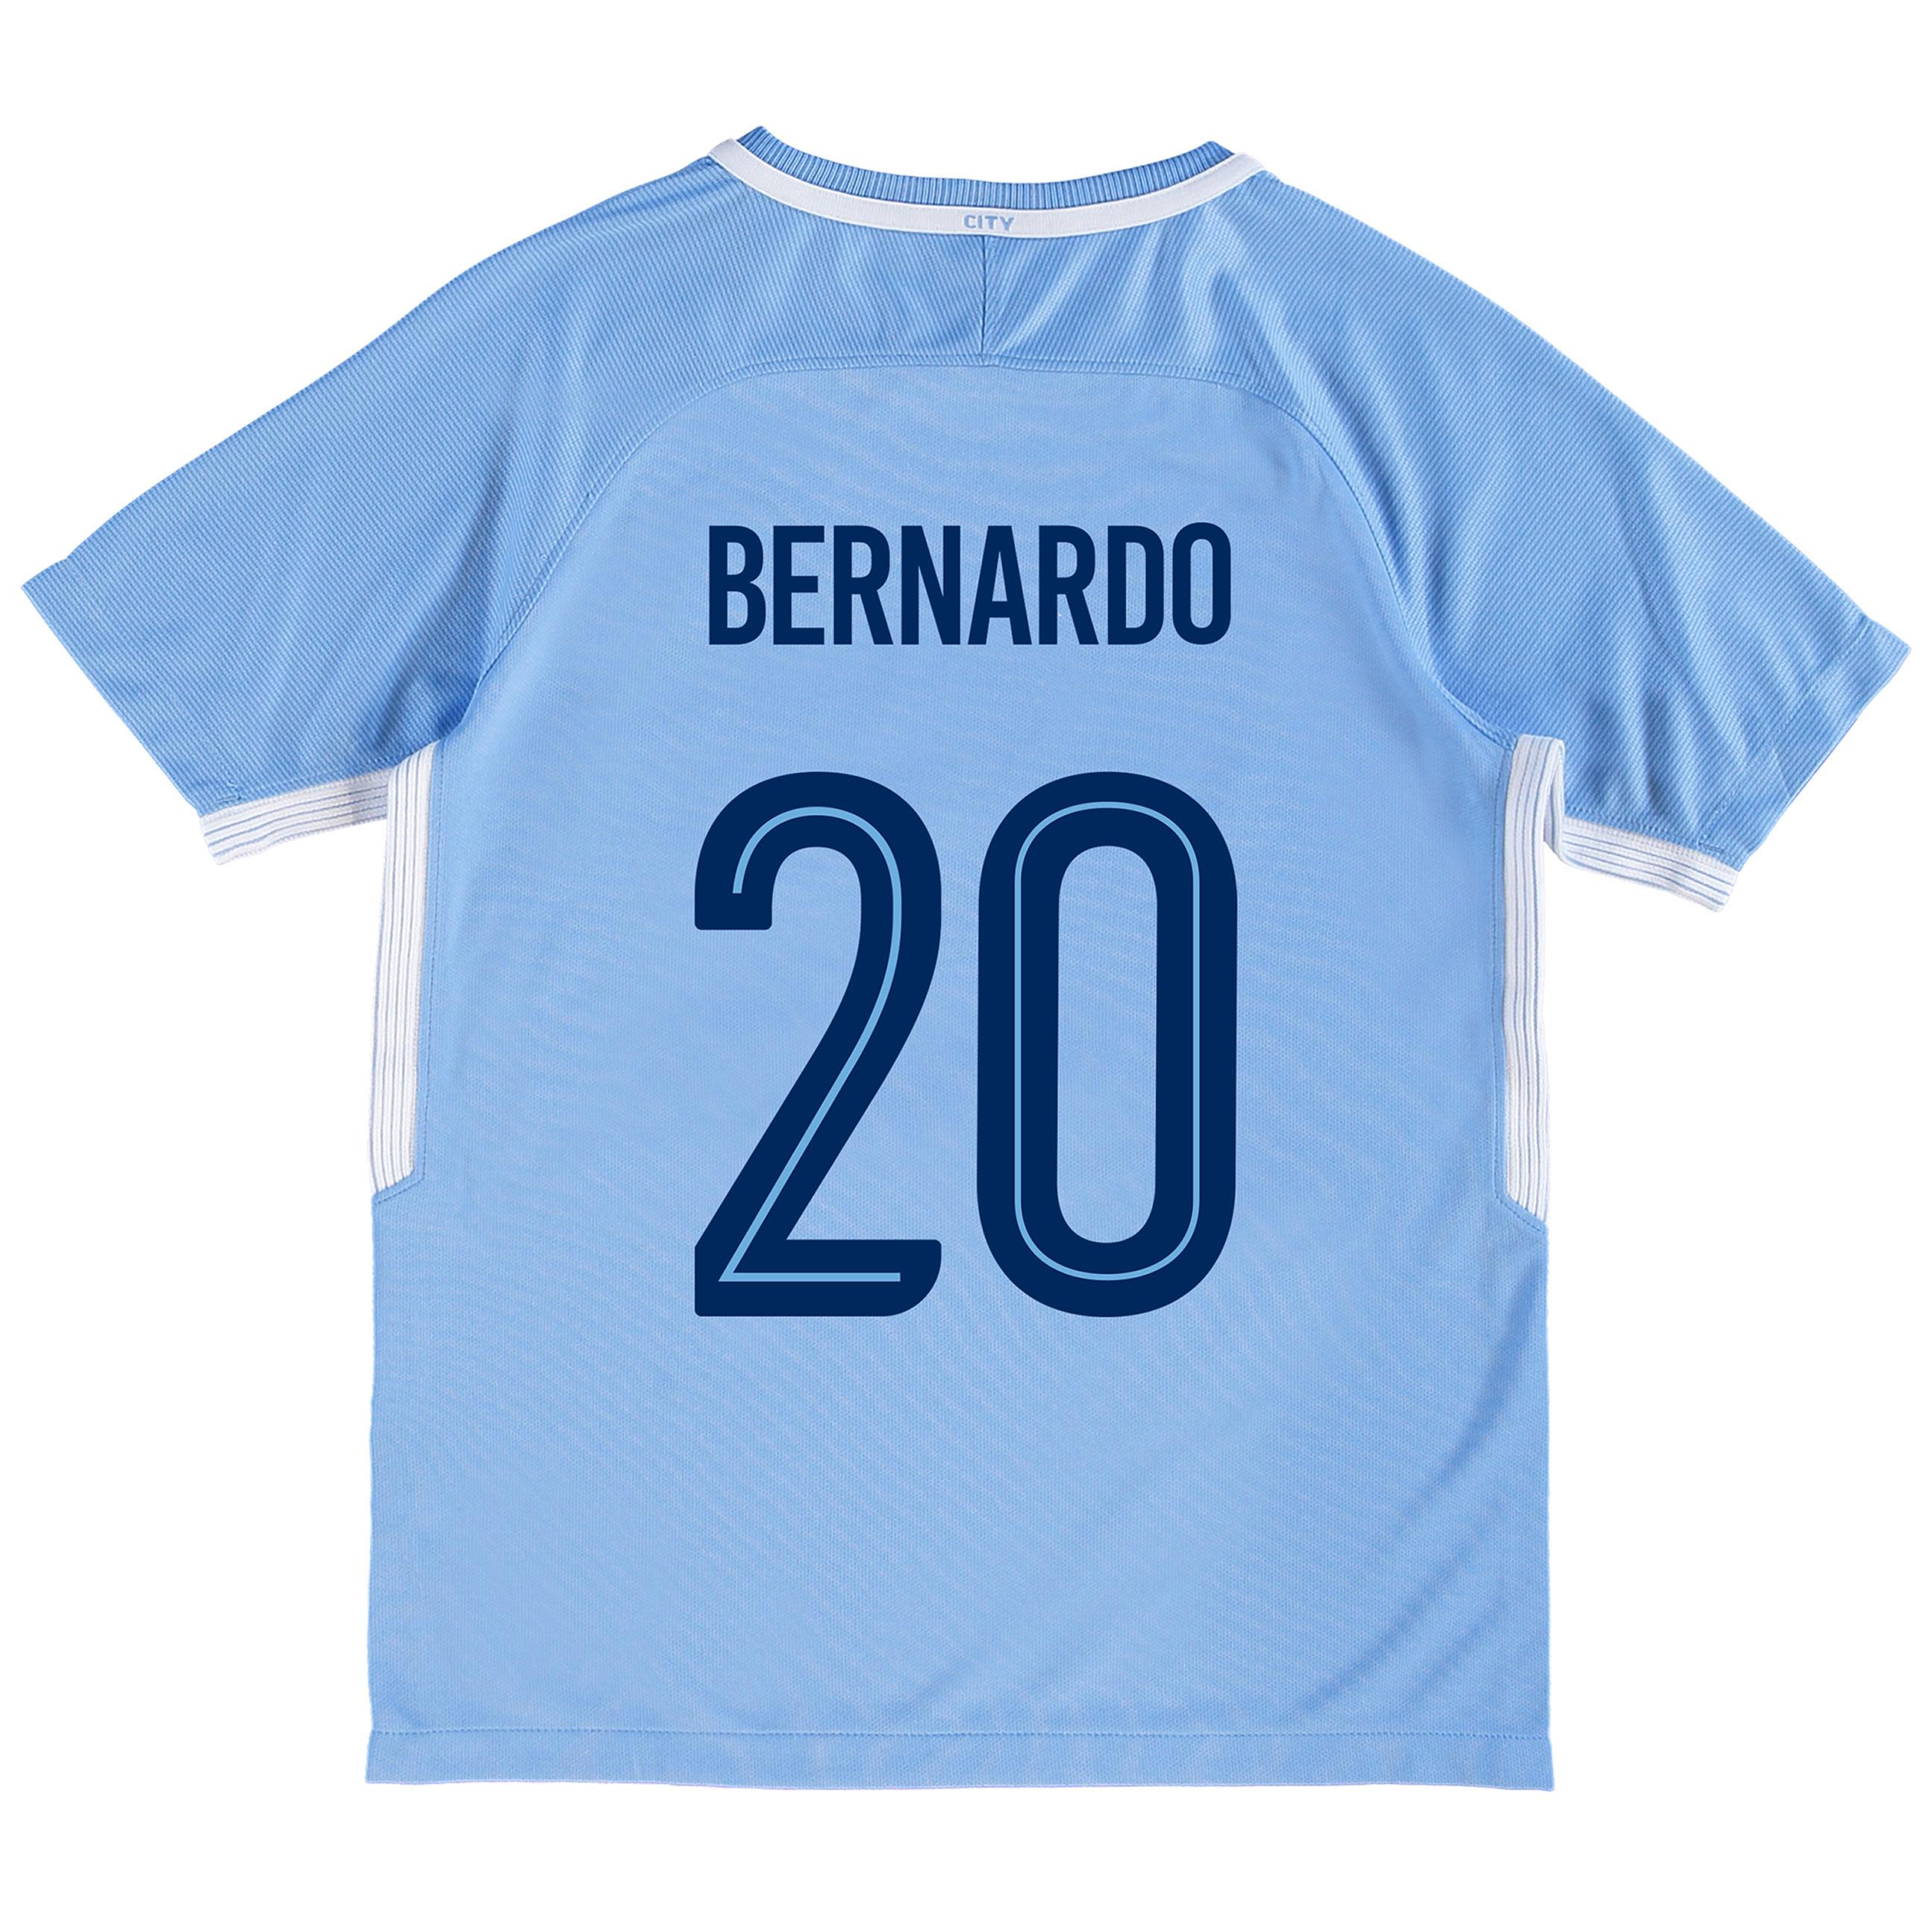 Manchester City Home Stadium Cup Shirt 2017-18 - Kids with Bernardo 20